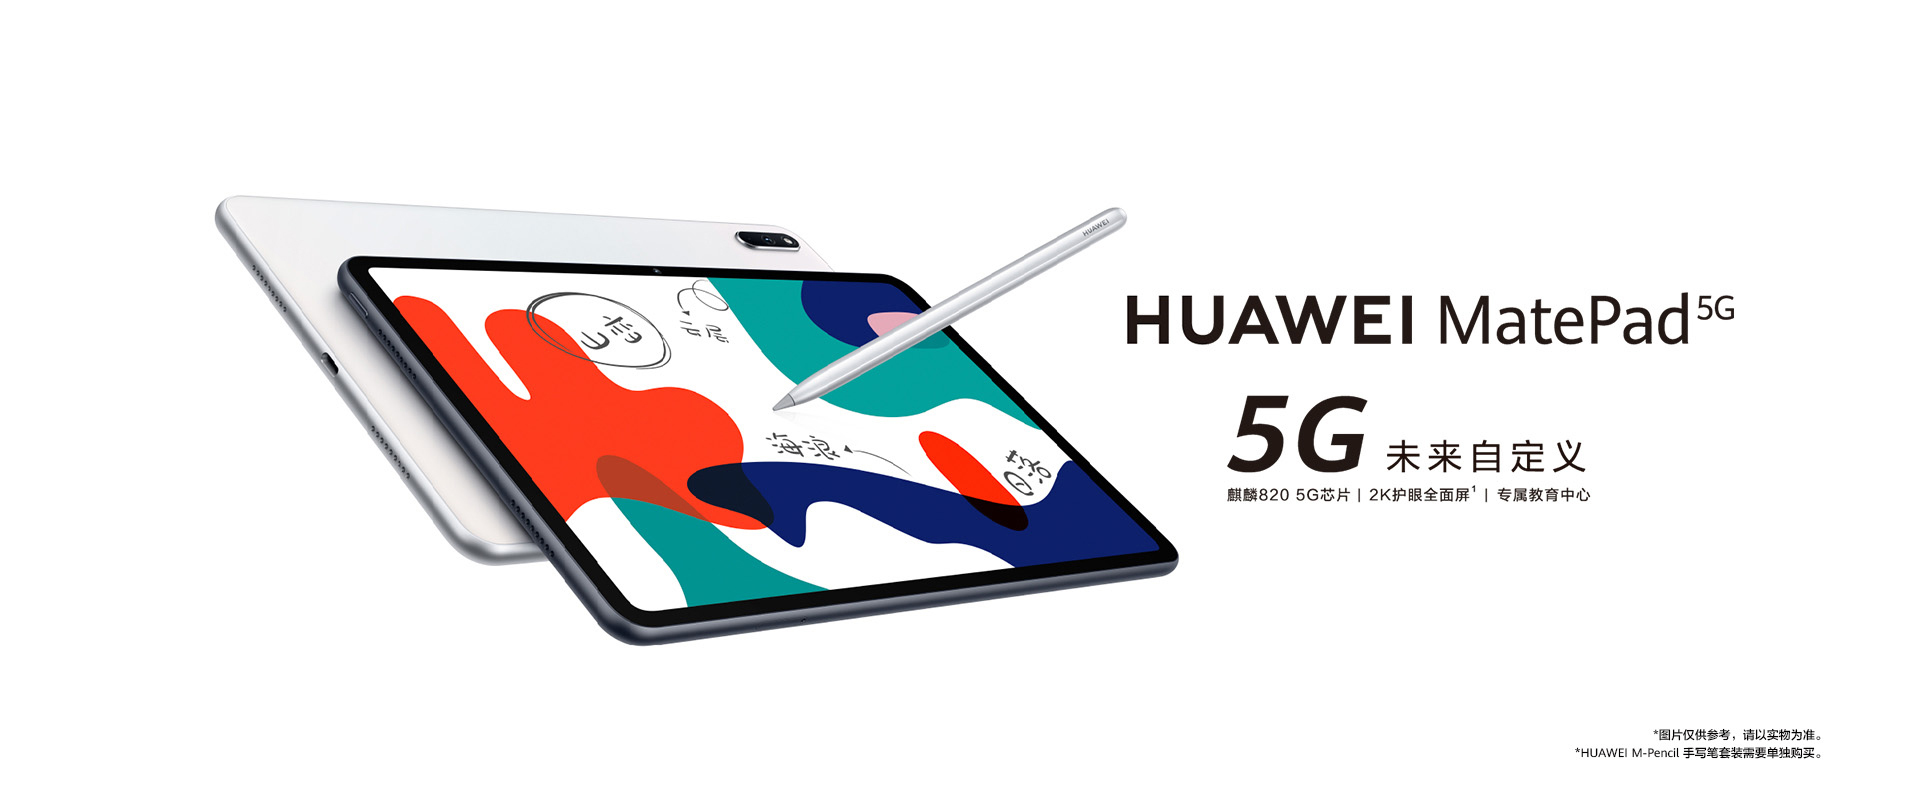 Huawei представила планшет MatePad 5G: тот же MatePad, только с 5G и процессором Kirin 820 за $470